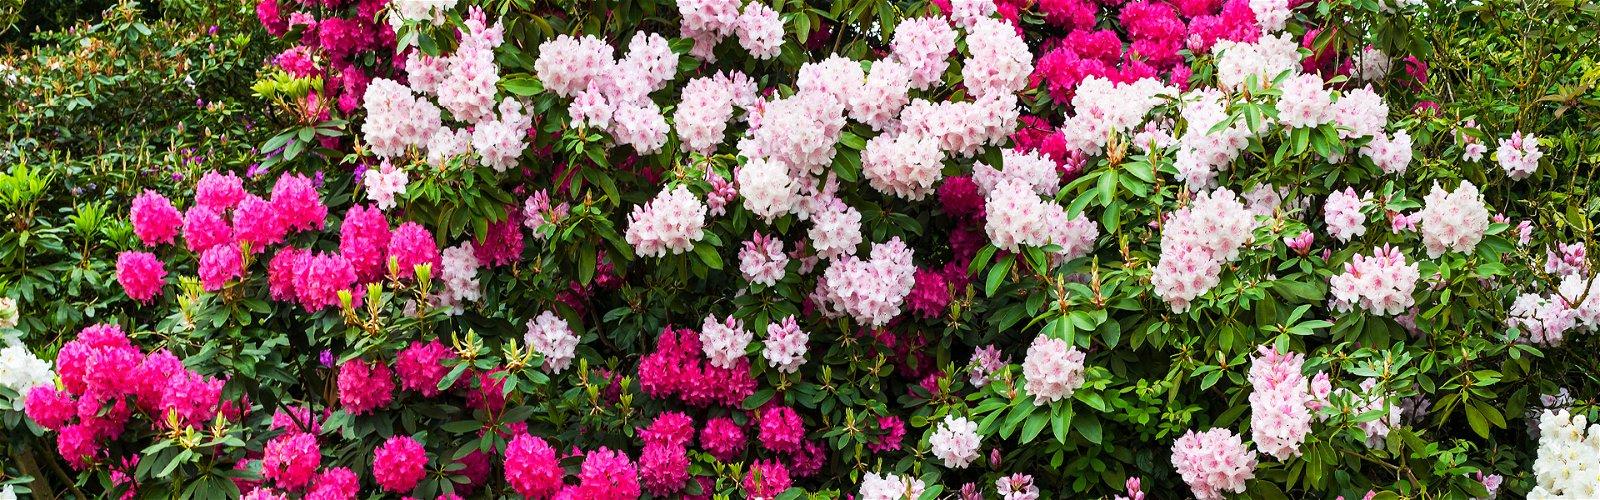 Rhododendronbuske